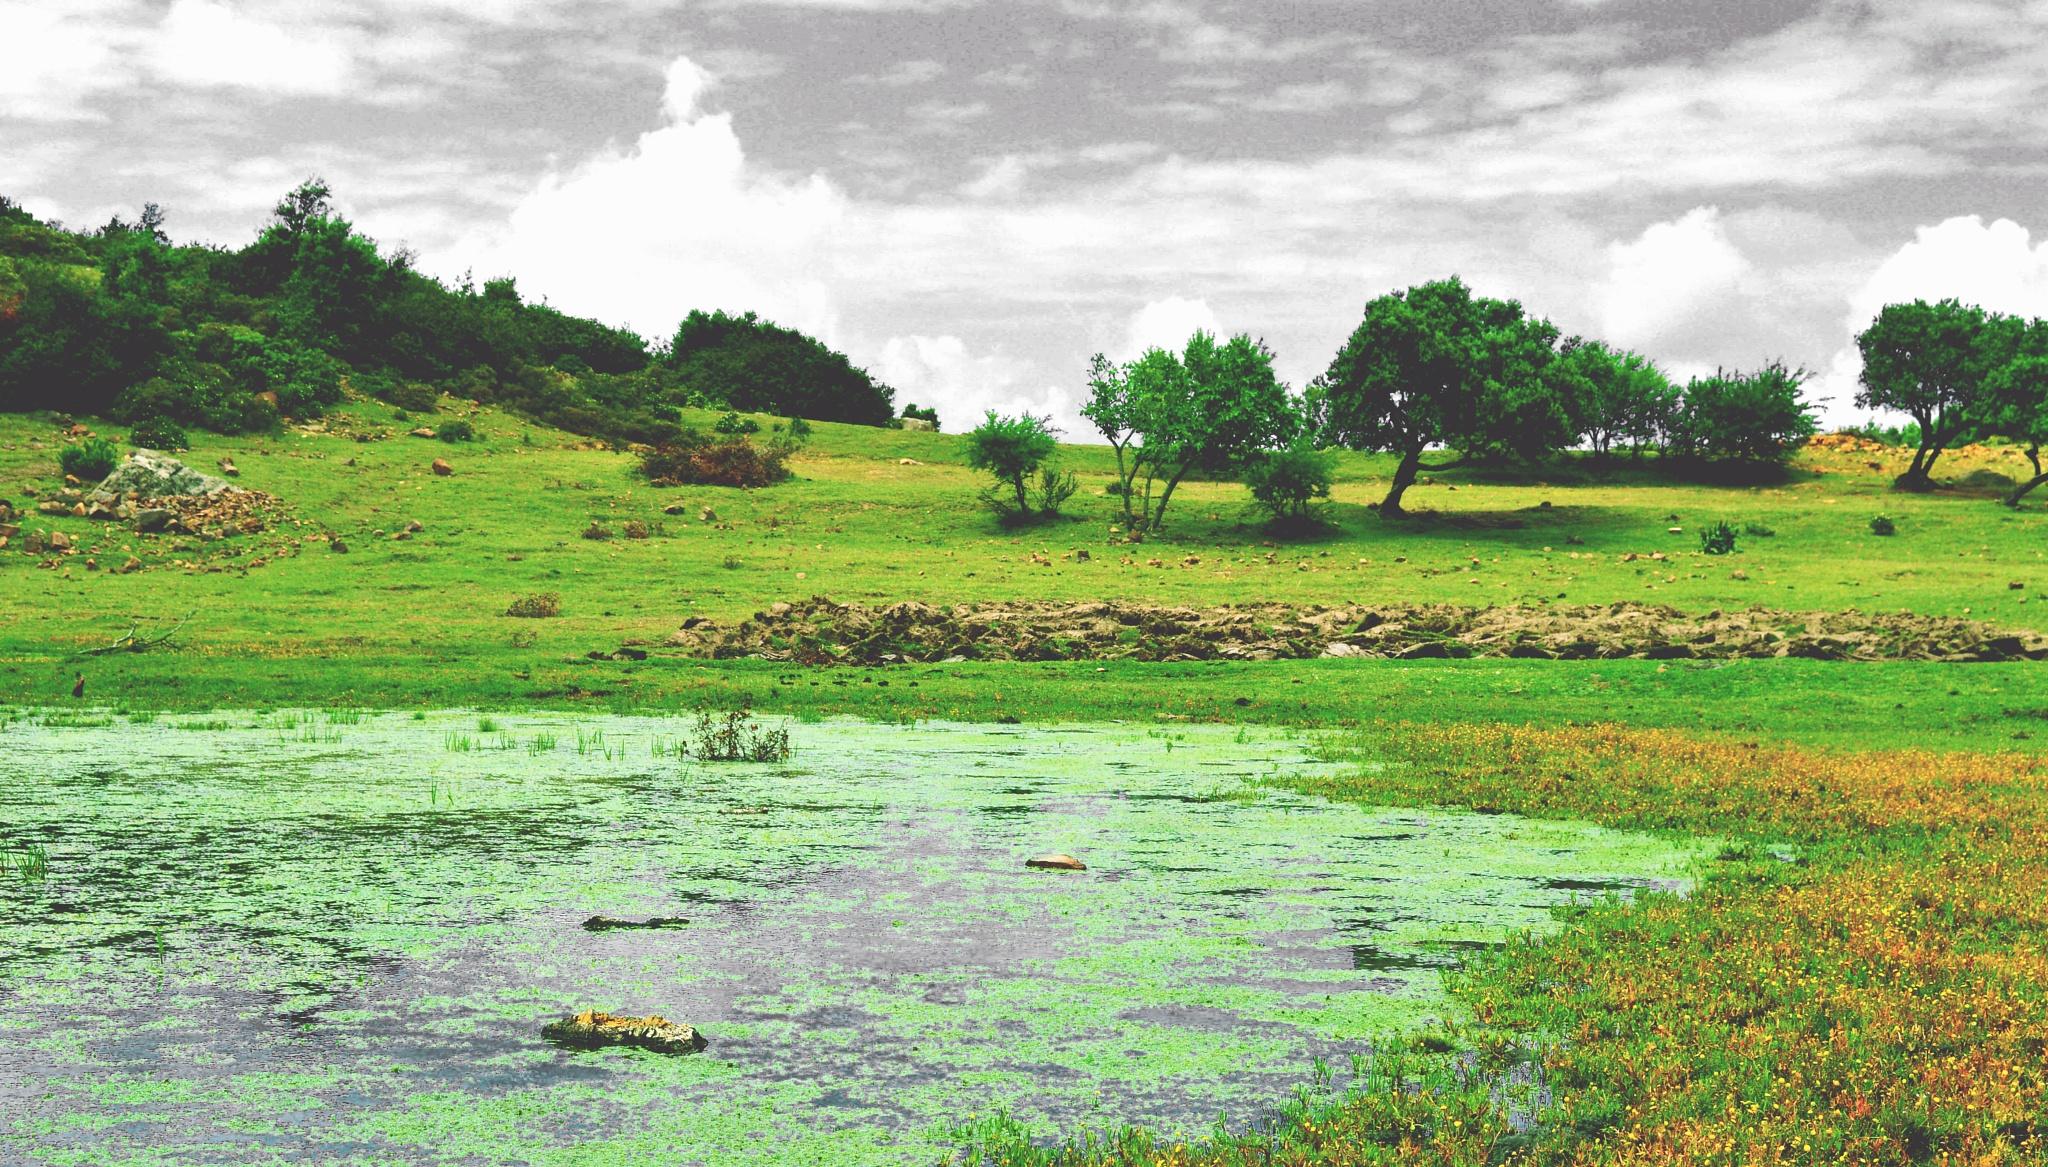 Swamp escape by BelgaTarkhani